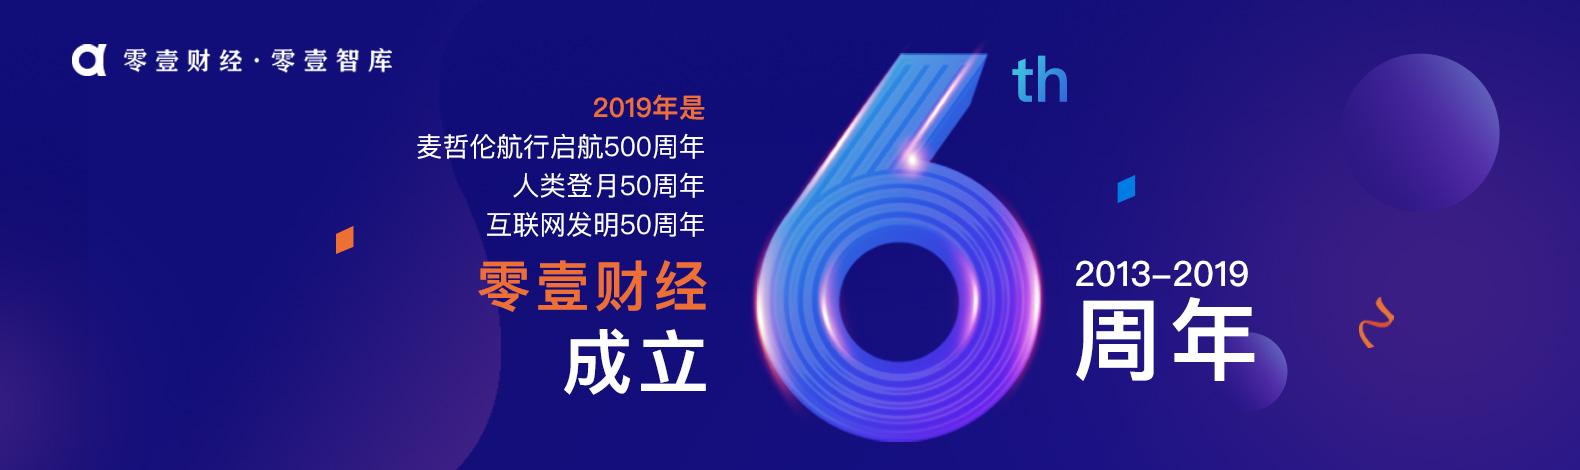 零壹财经成立6周年